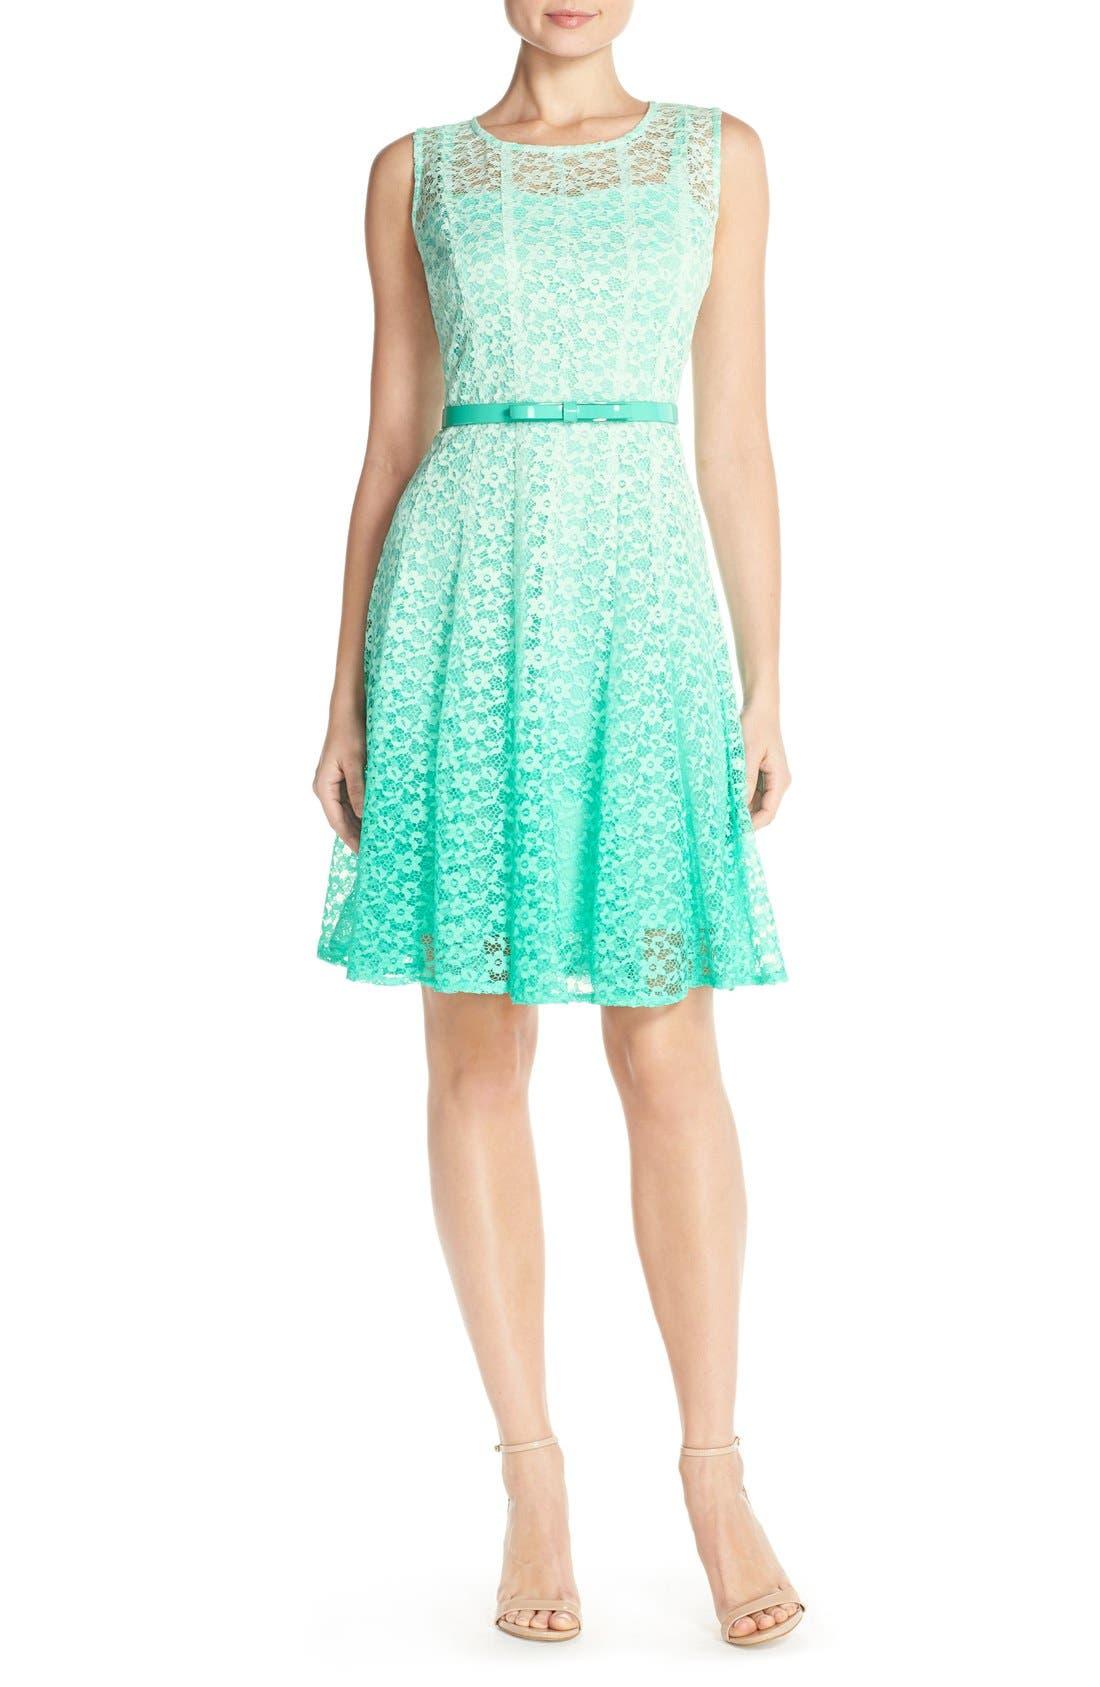 Main Image - Chetta B Ombré Lace Sleeveless A-Line Dress with Belt